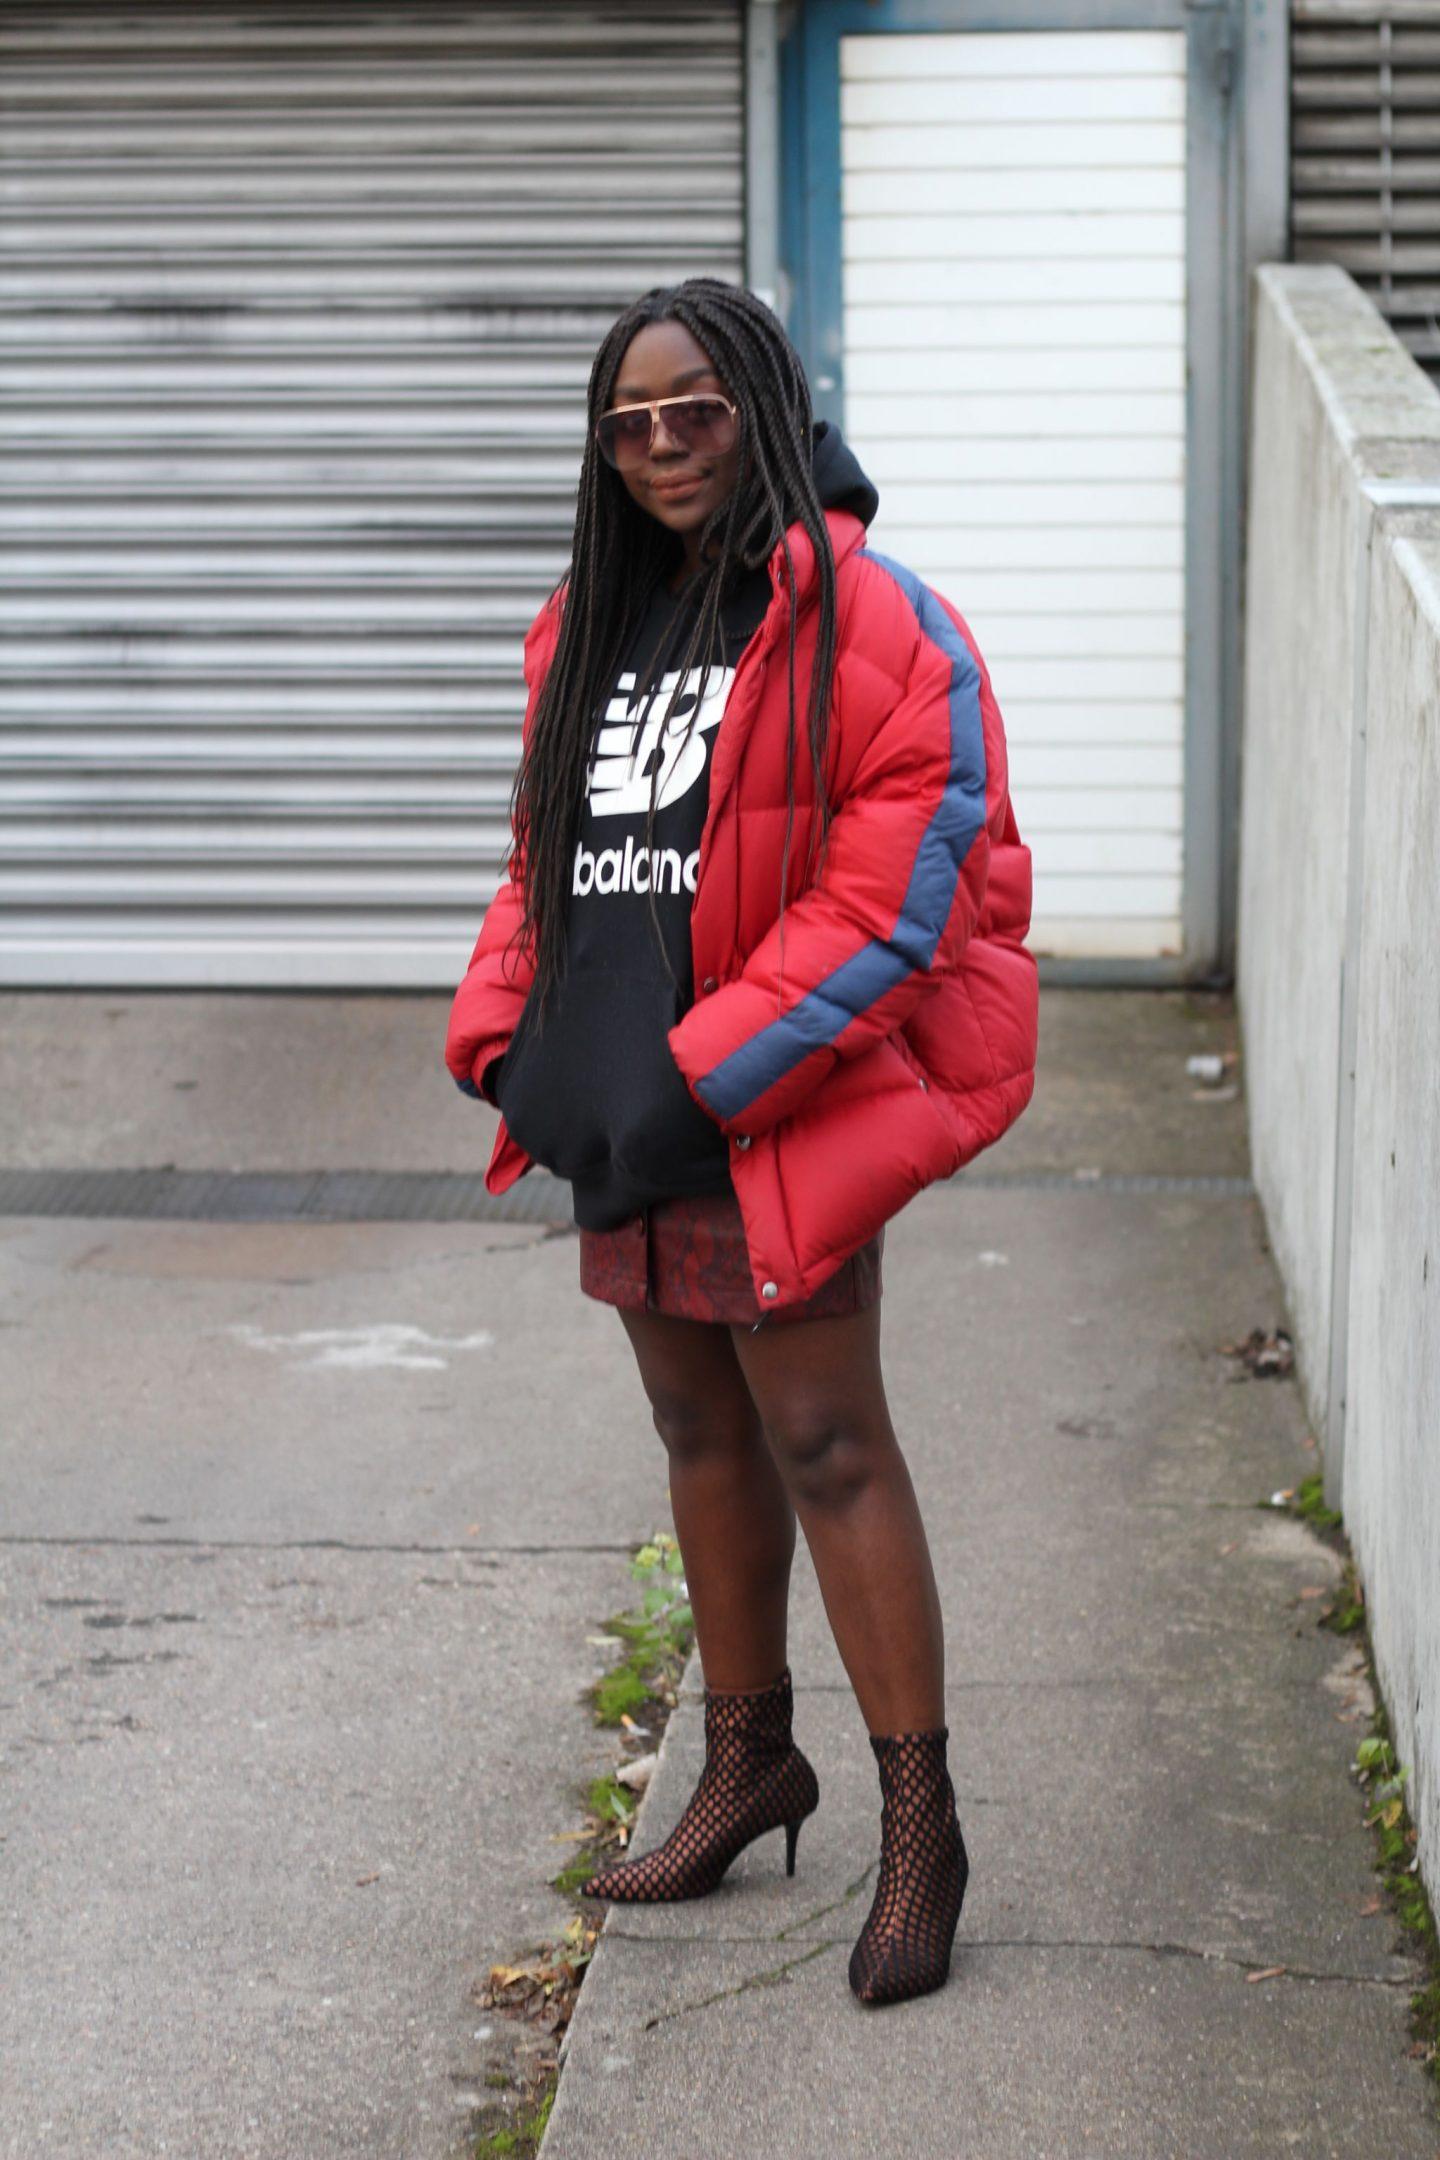 streetwear_chic_lois_opoku_fashion_blog_style_berlin_lisforlois_3